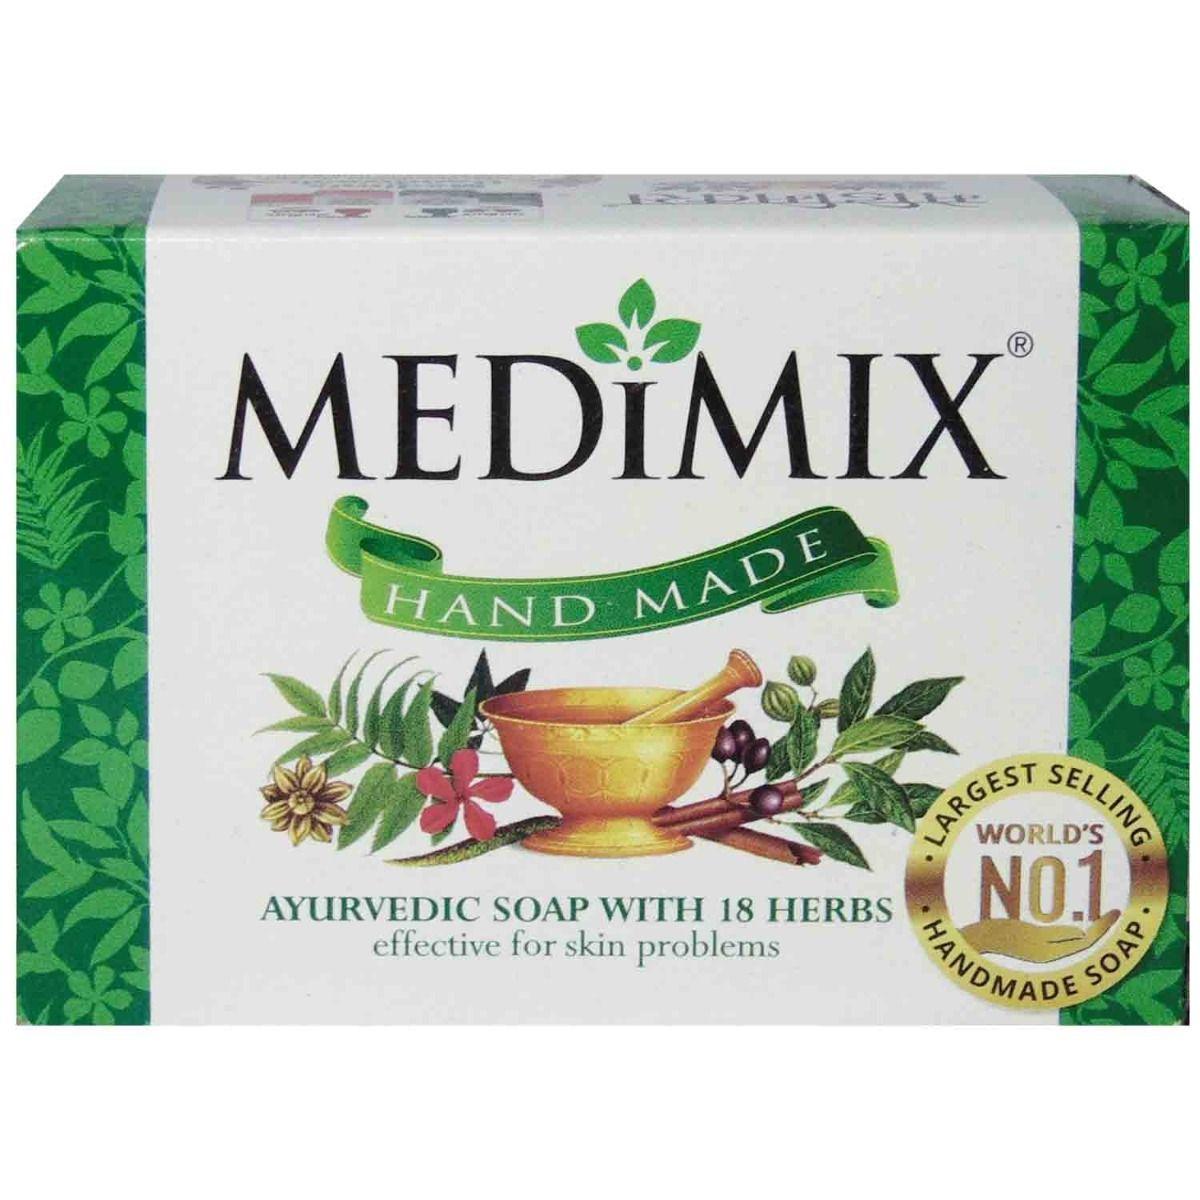 Medimix Ayurvedic Soap, 125 gm